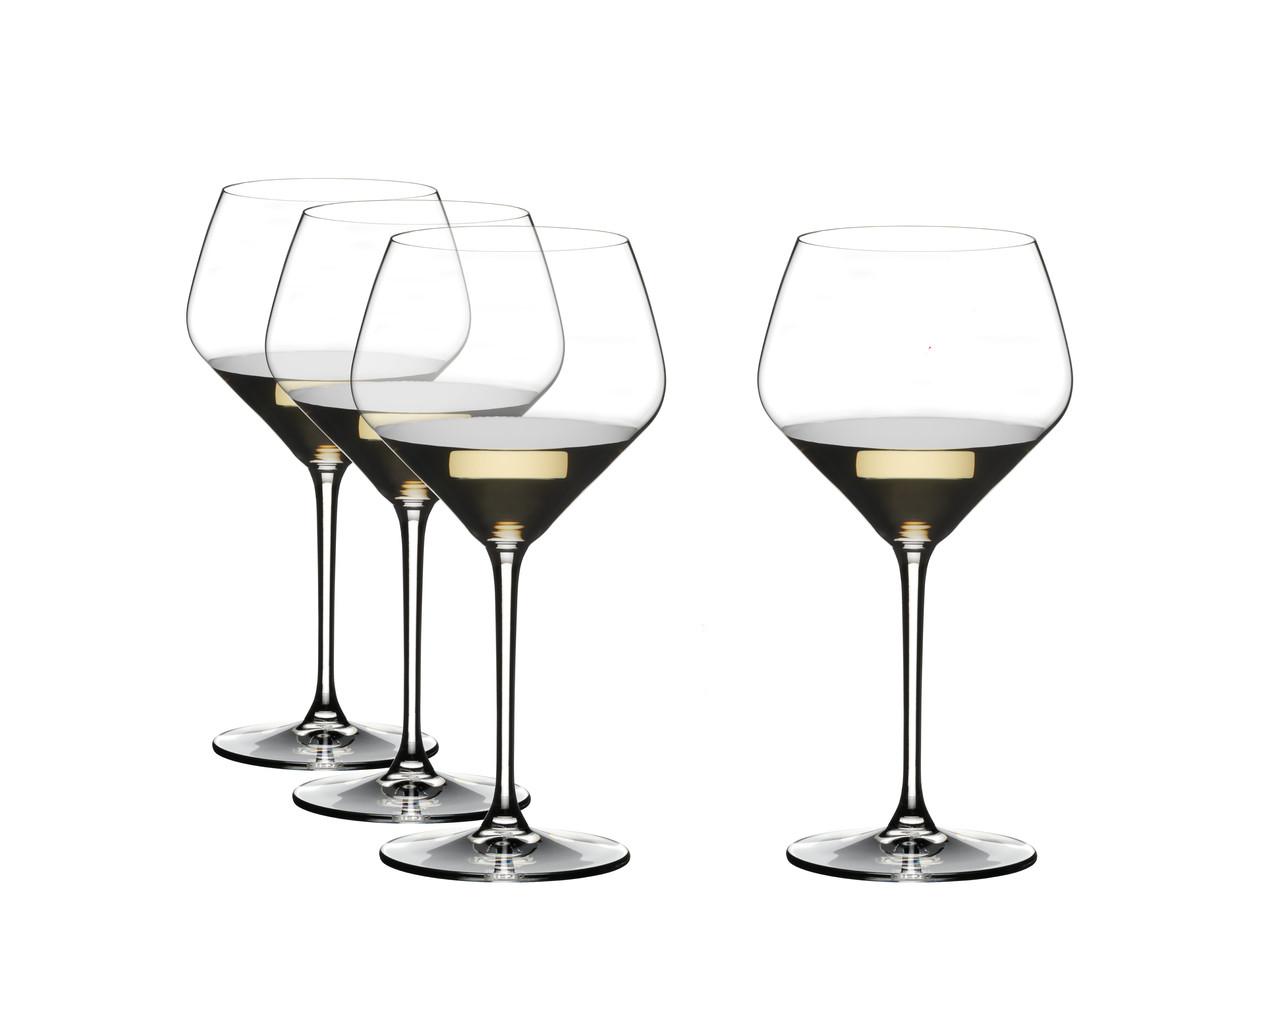 Набор хрустальных бокалов для белого вина Oaked Chardonnay Riedel Vinum Extreme  670 мл 4 шт 4411/97